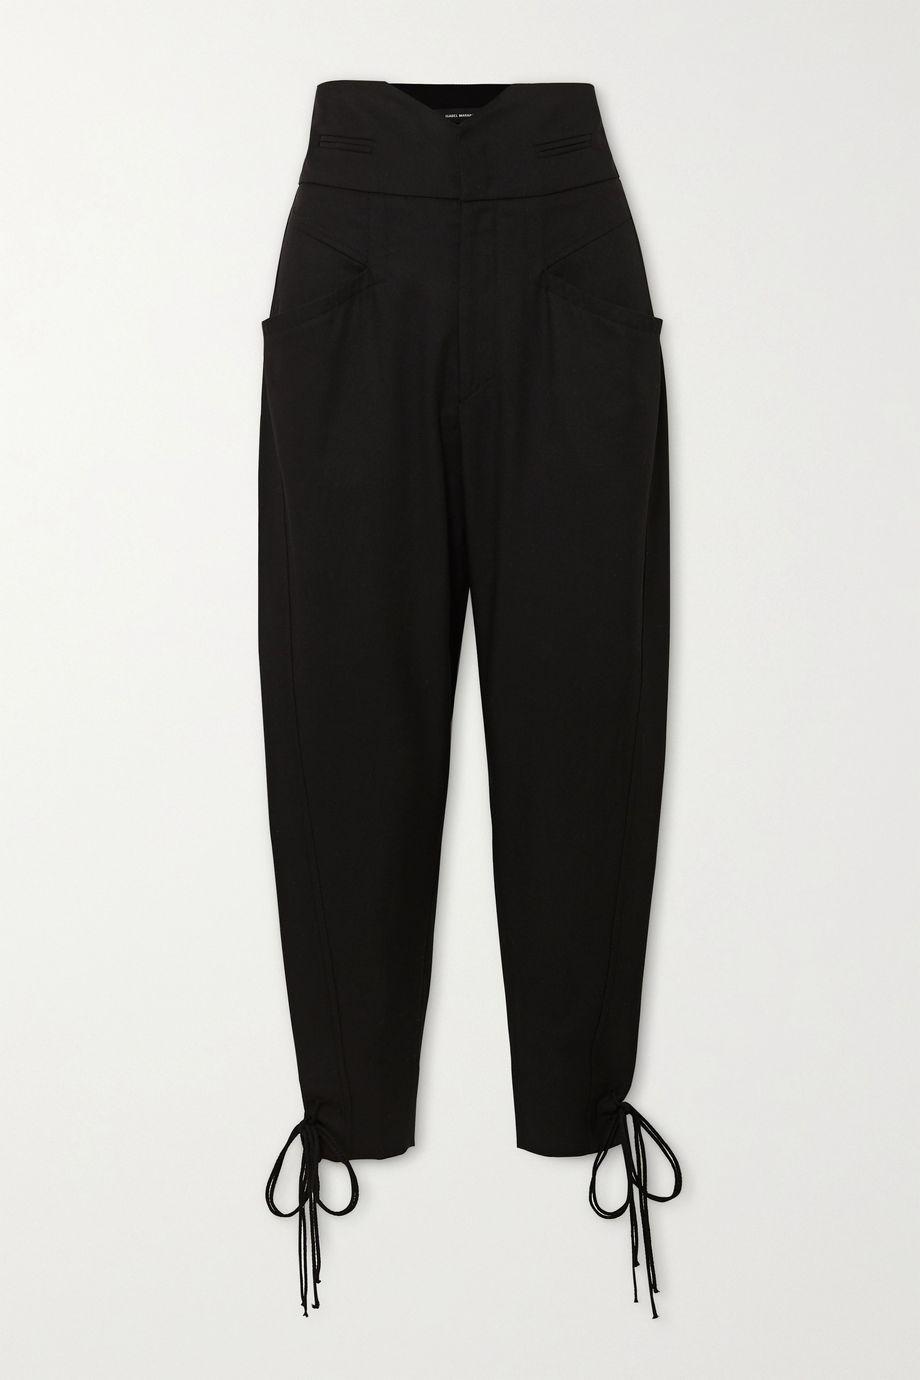 Isabel Marant Ubaia cotton-blend tapered pants